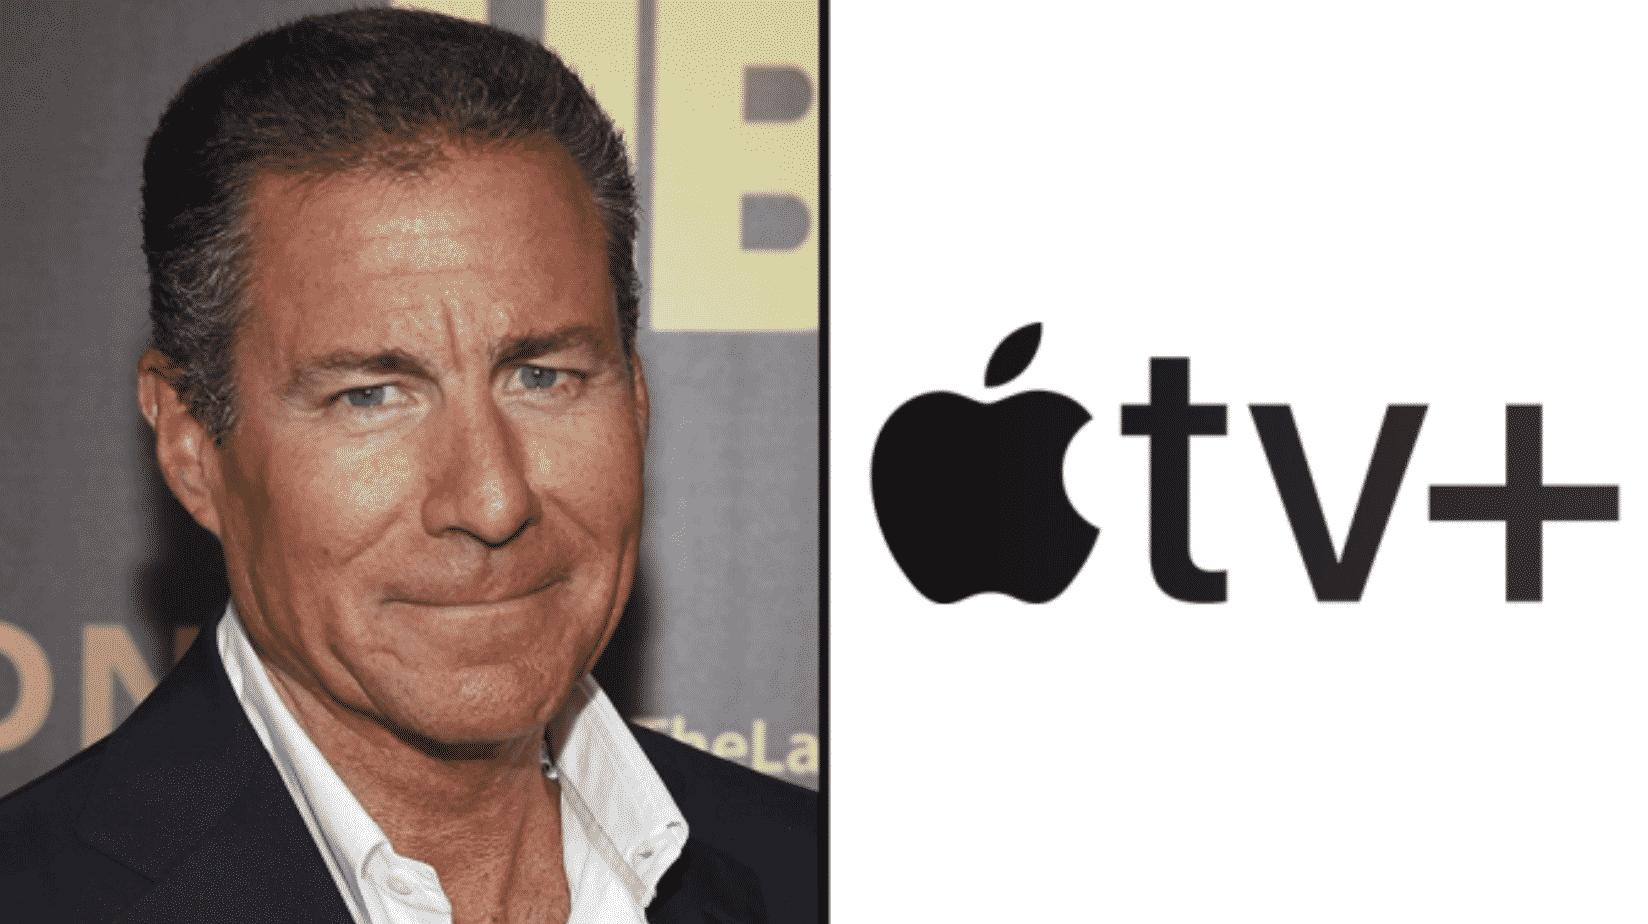 Richard Plepler on Apple TV+